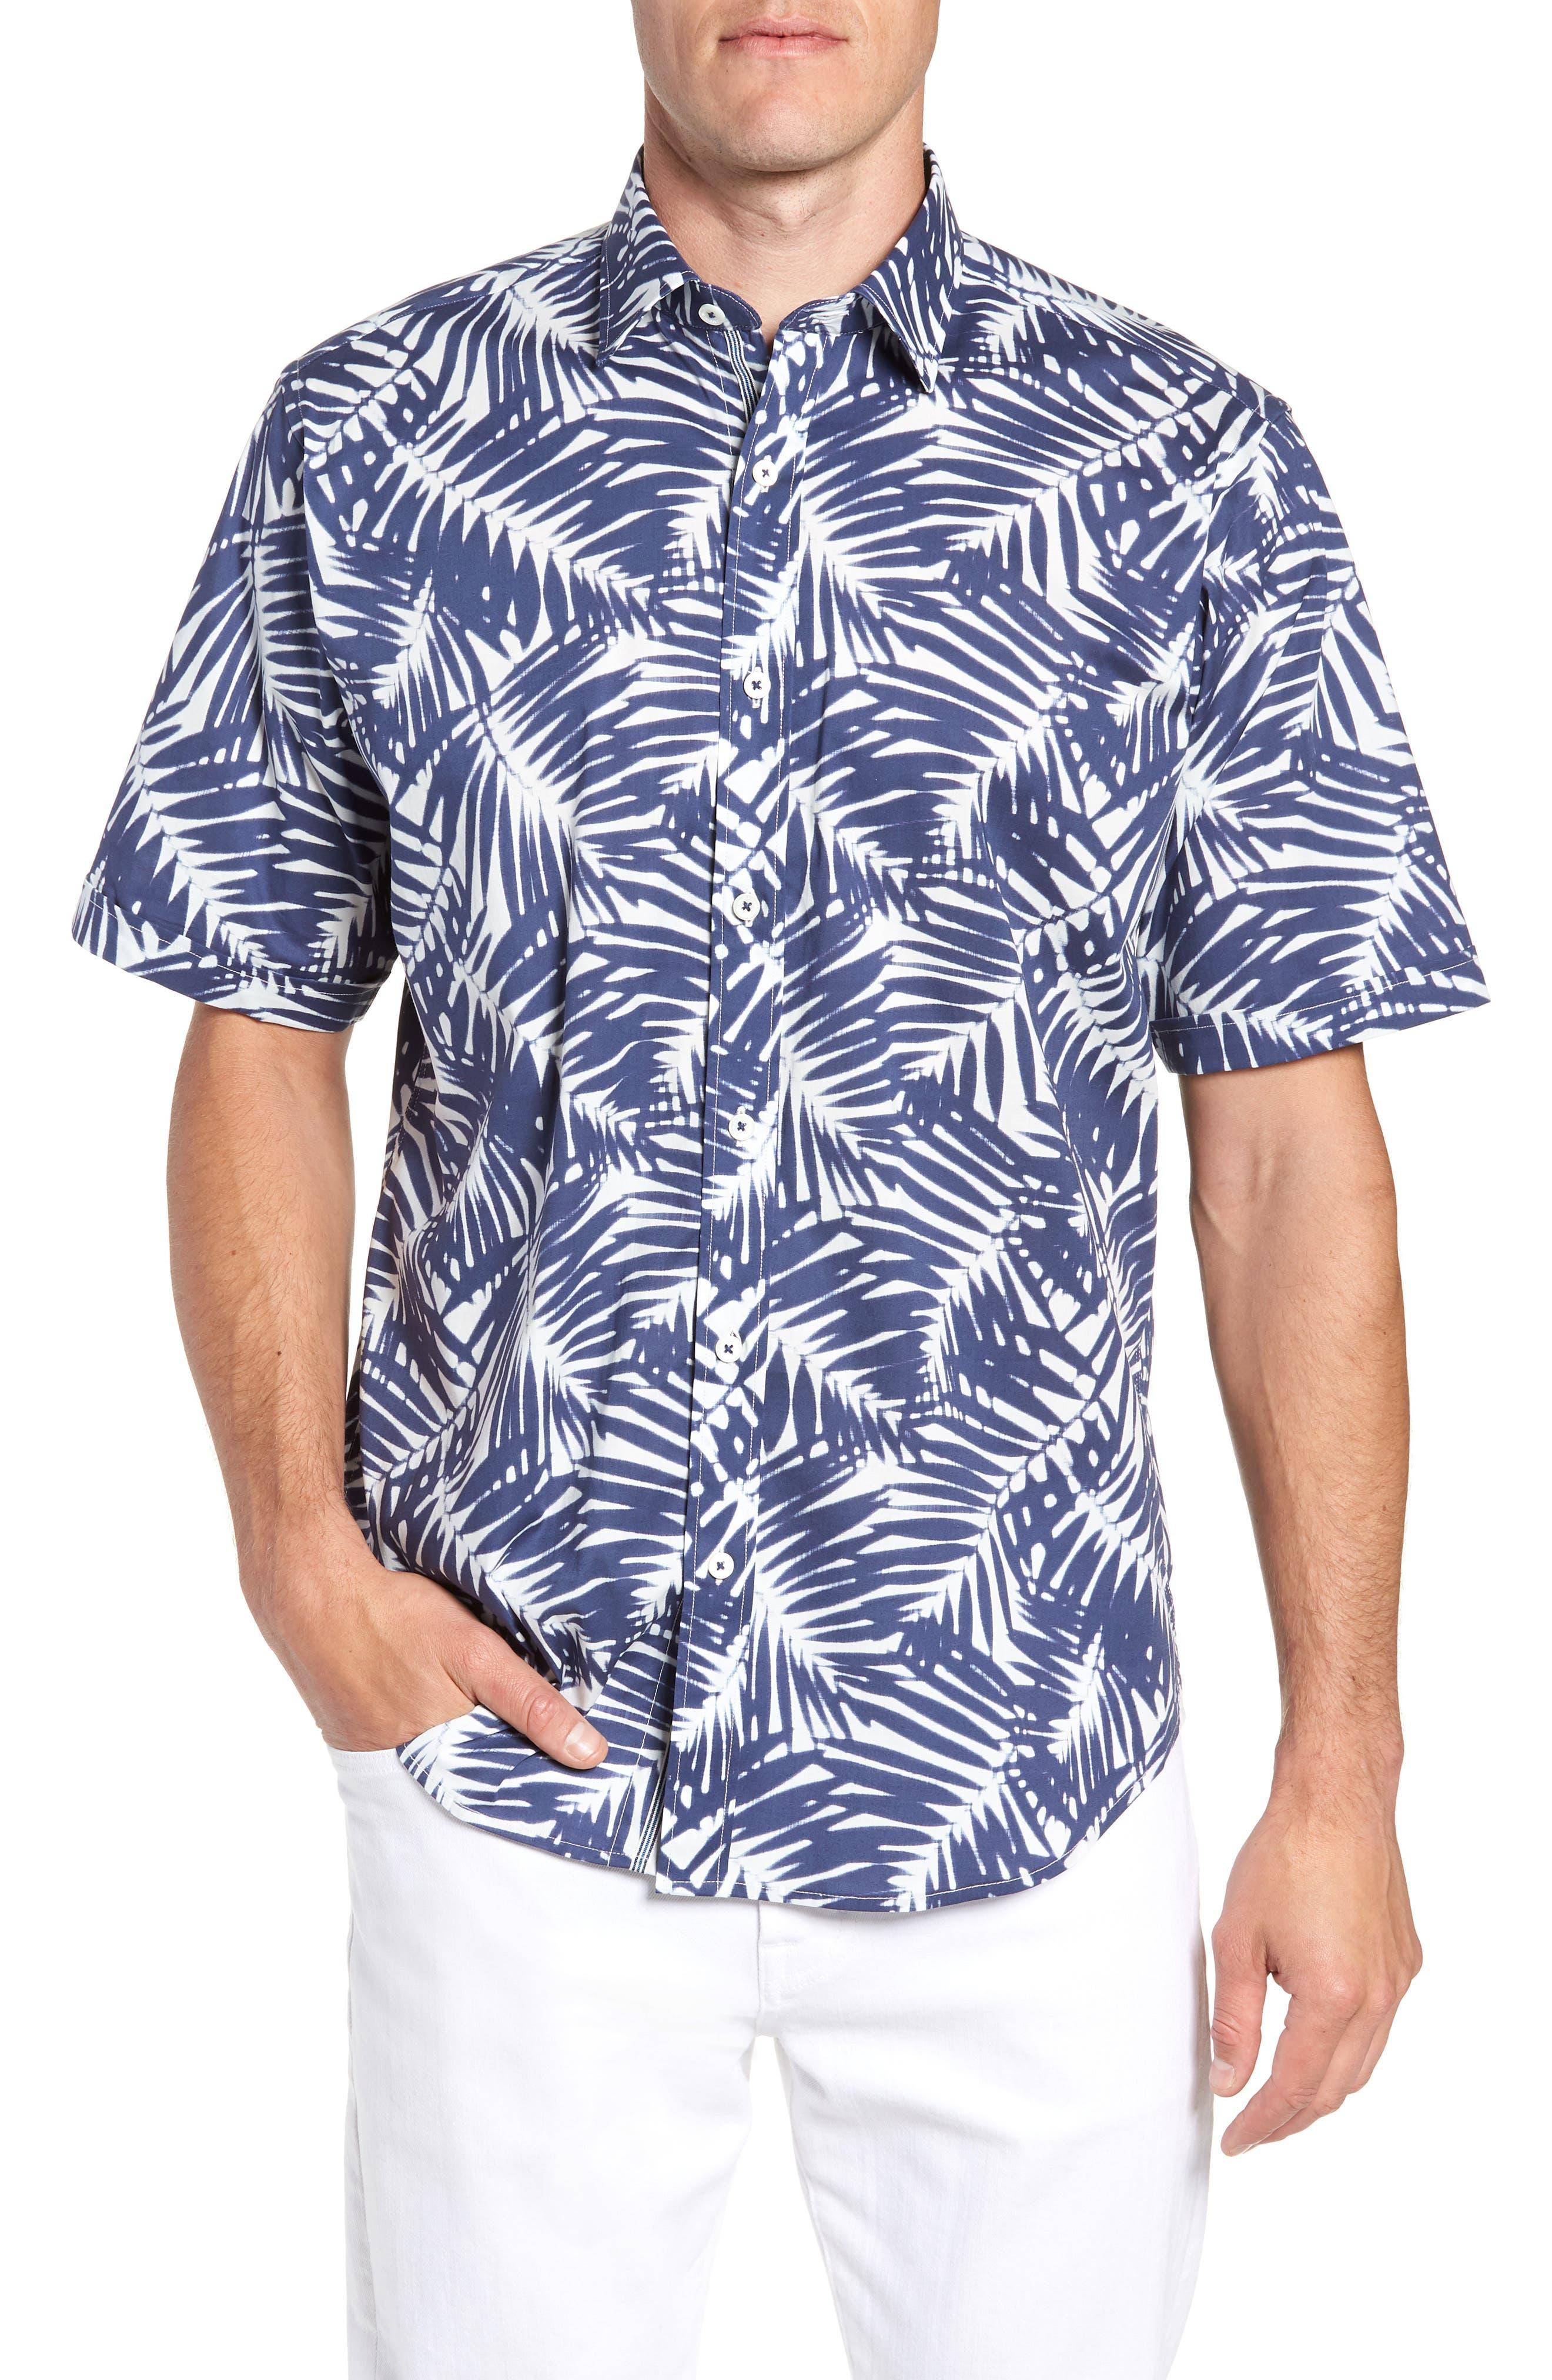 Indigo Palms Classic Fit Sport Shirt,                             Main thumbnail 1, color,                             Navy